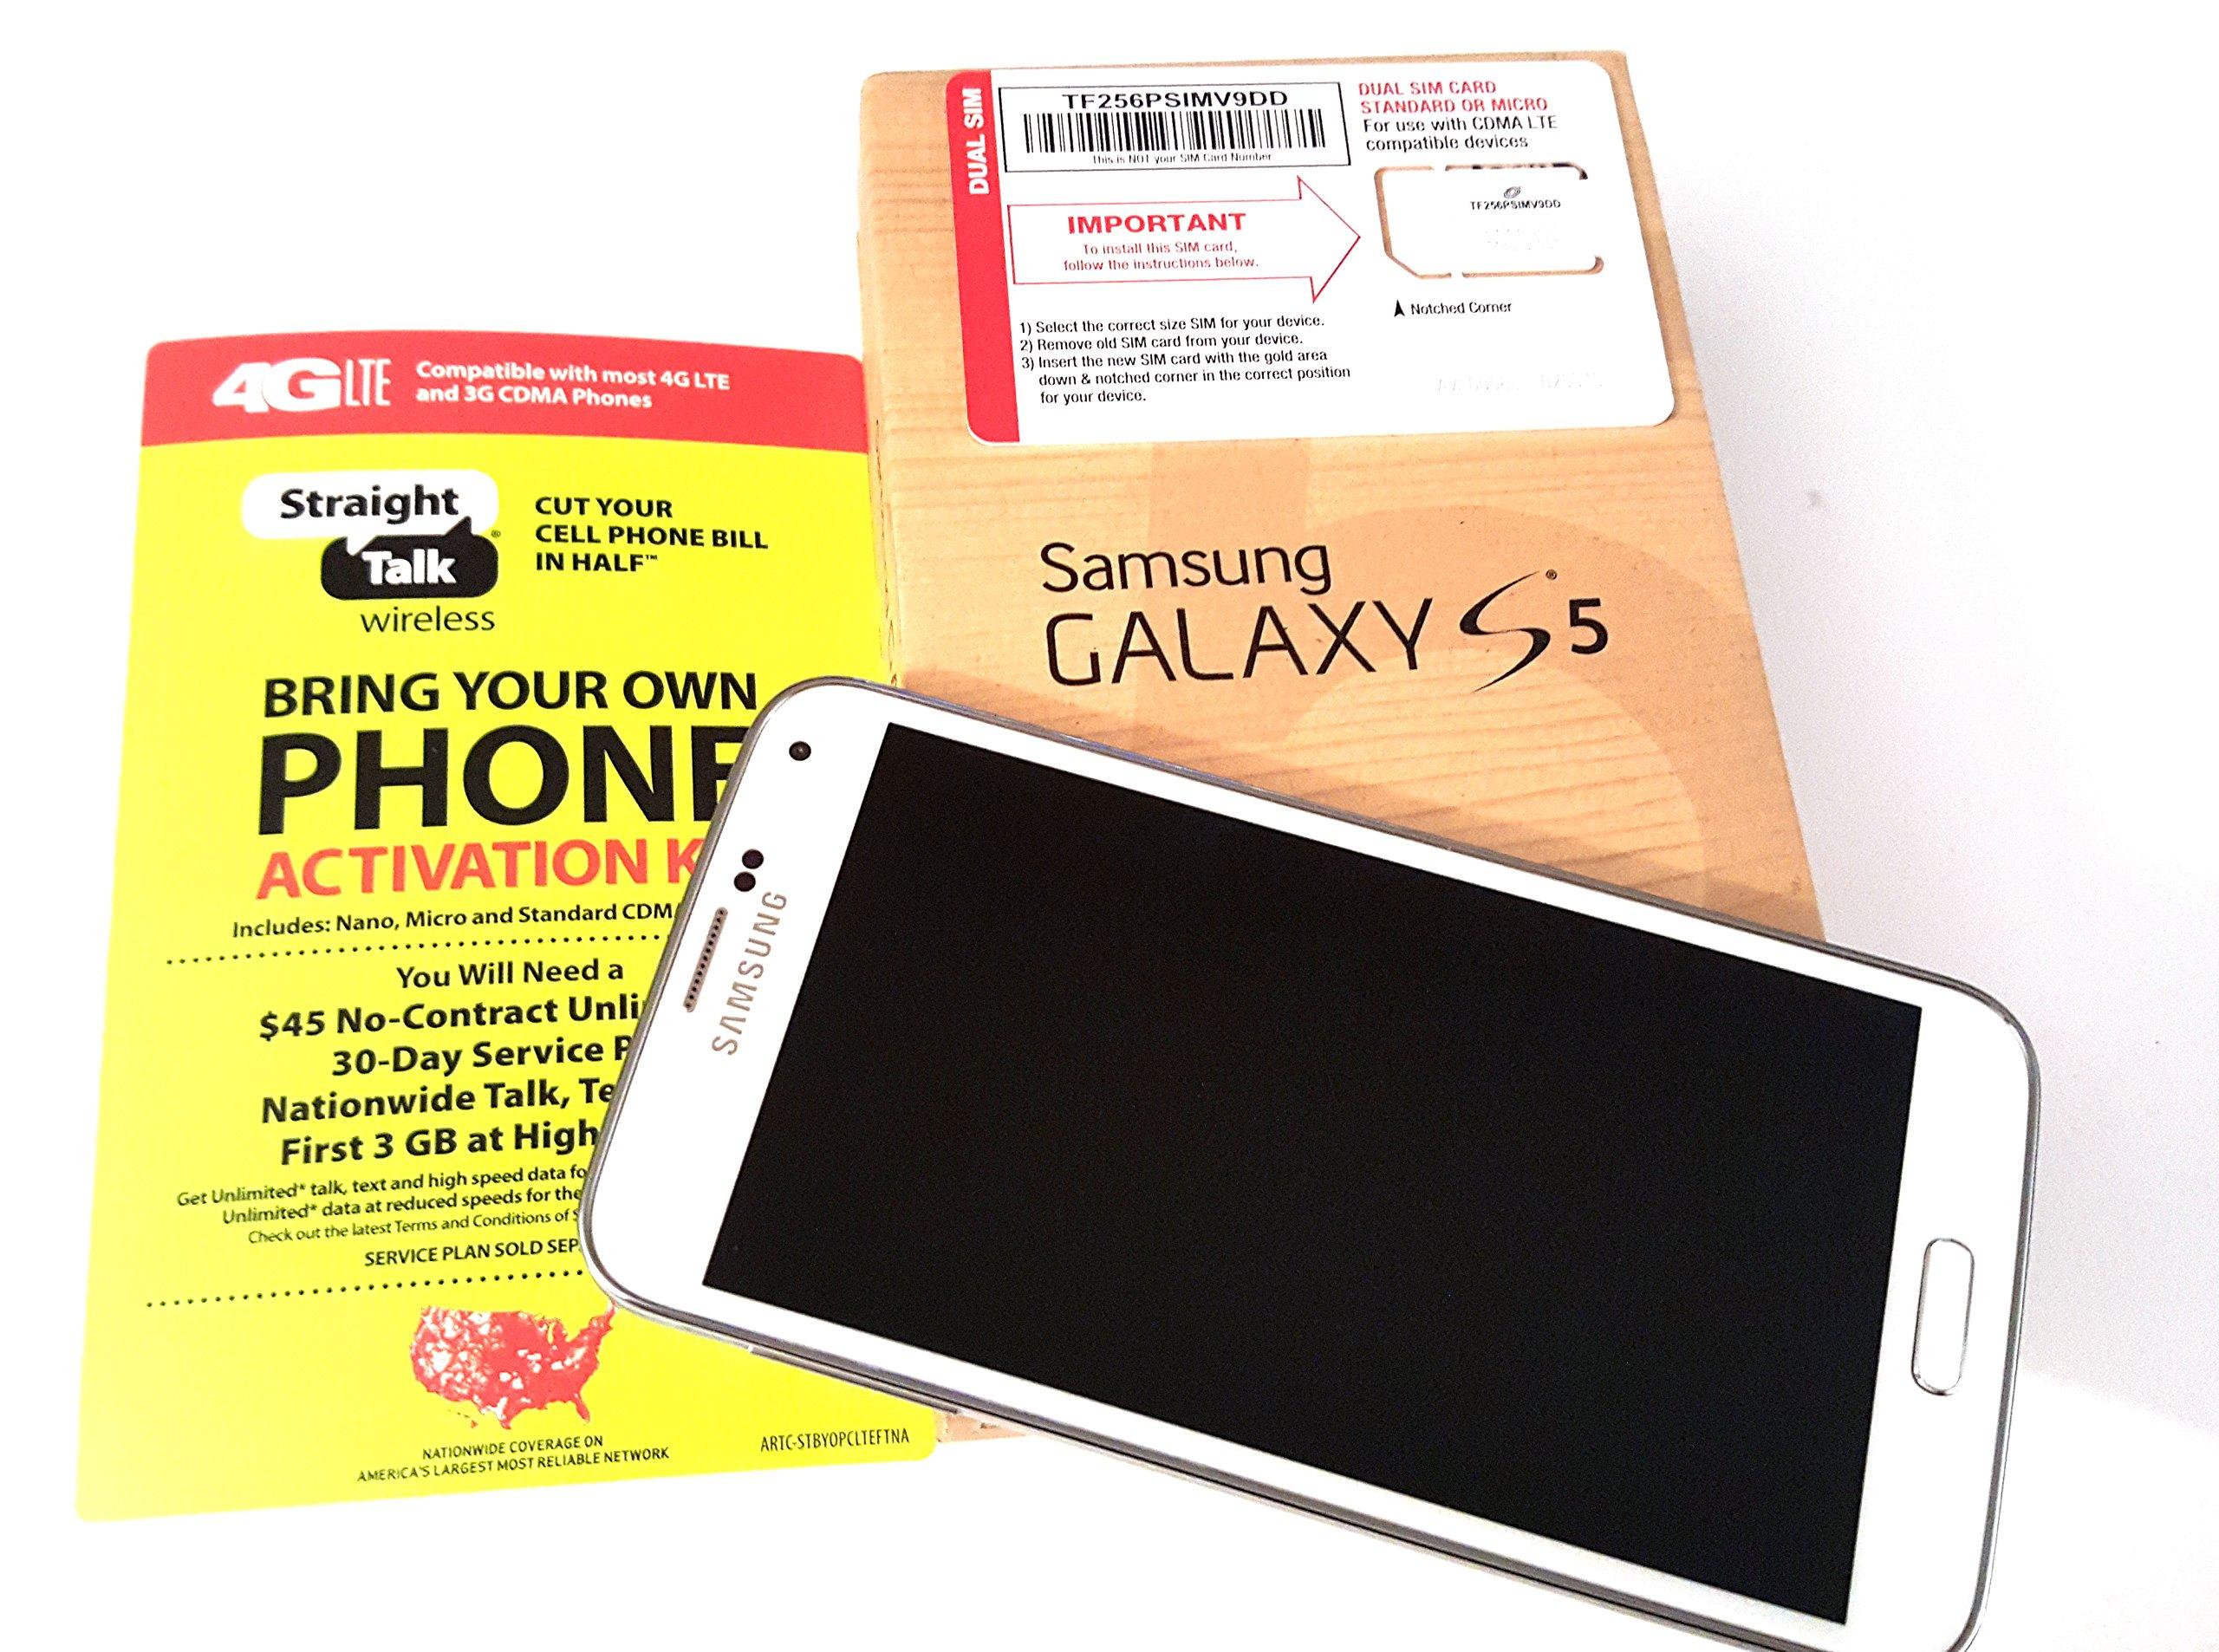 Buy Samsung Galaxy Note 4 Verizon/Straight Talk unlocked, runs on